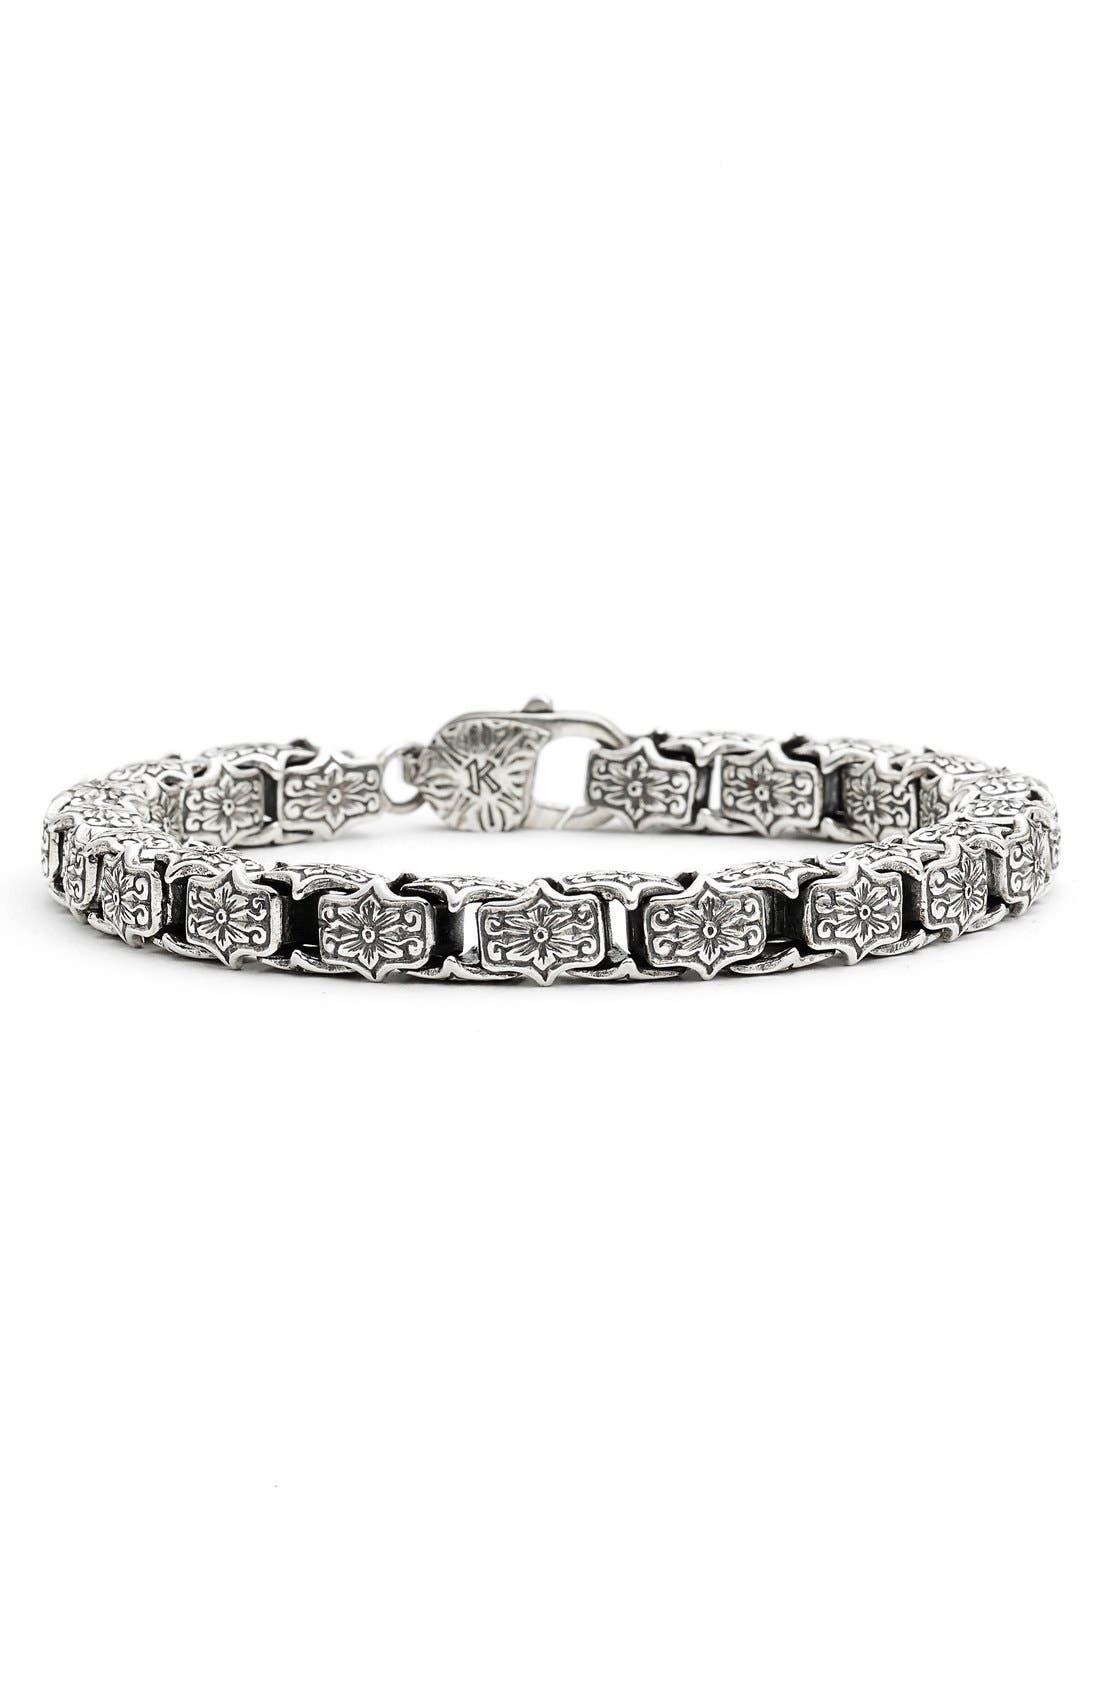 Main Image - Konstantino 'Minos' Etched Medium Link Bracelet